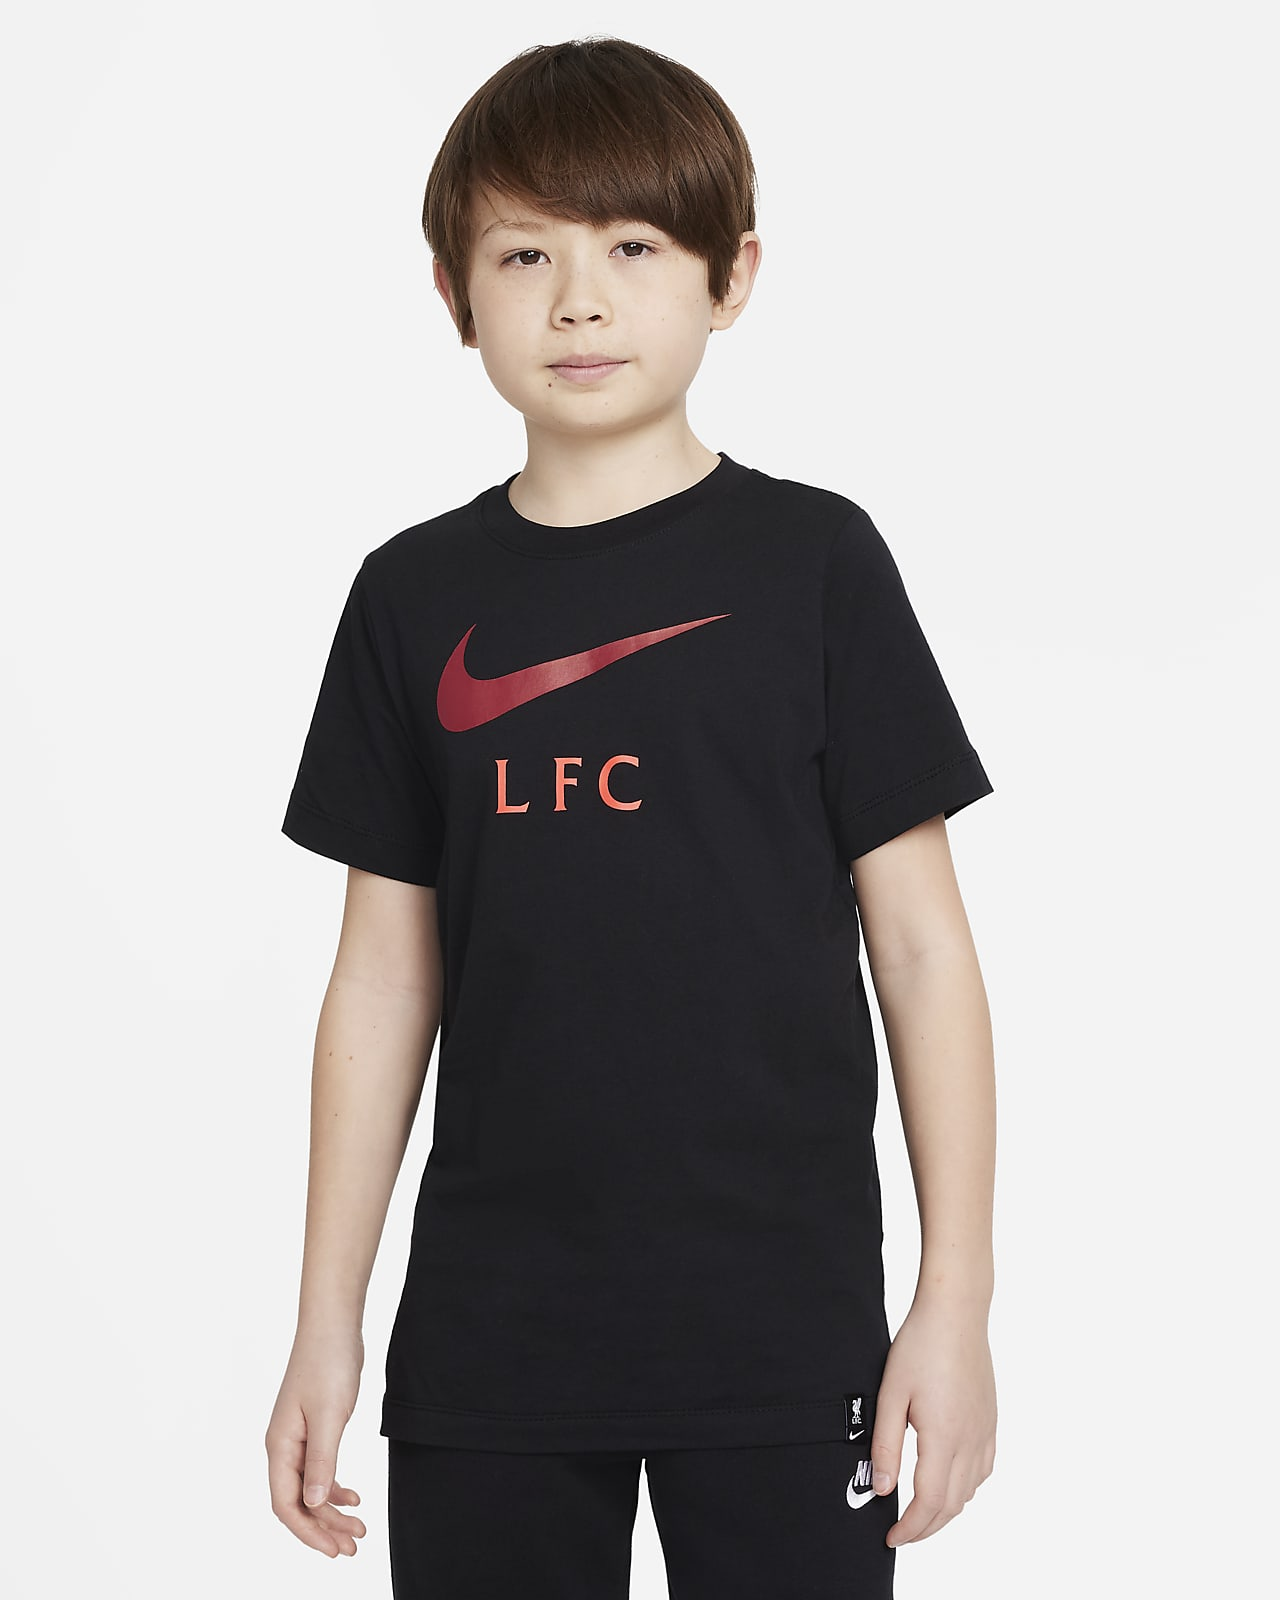 Liverpool F.C. Older Kids' Football T-Shirt